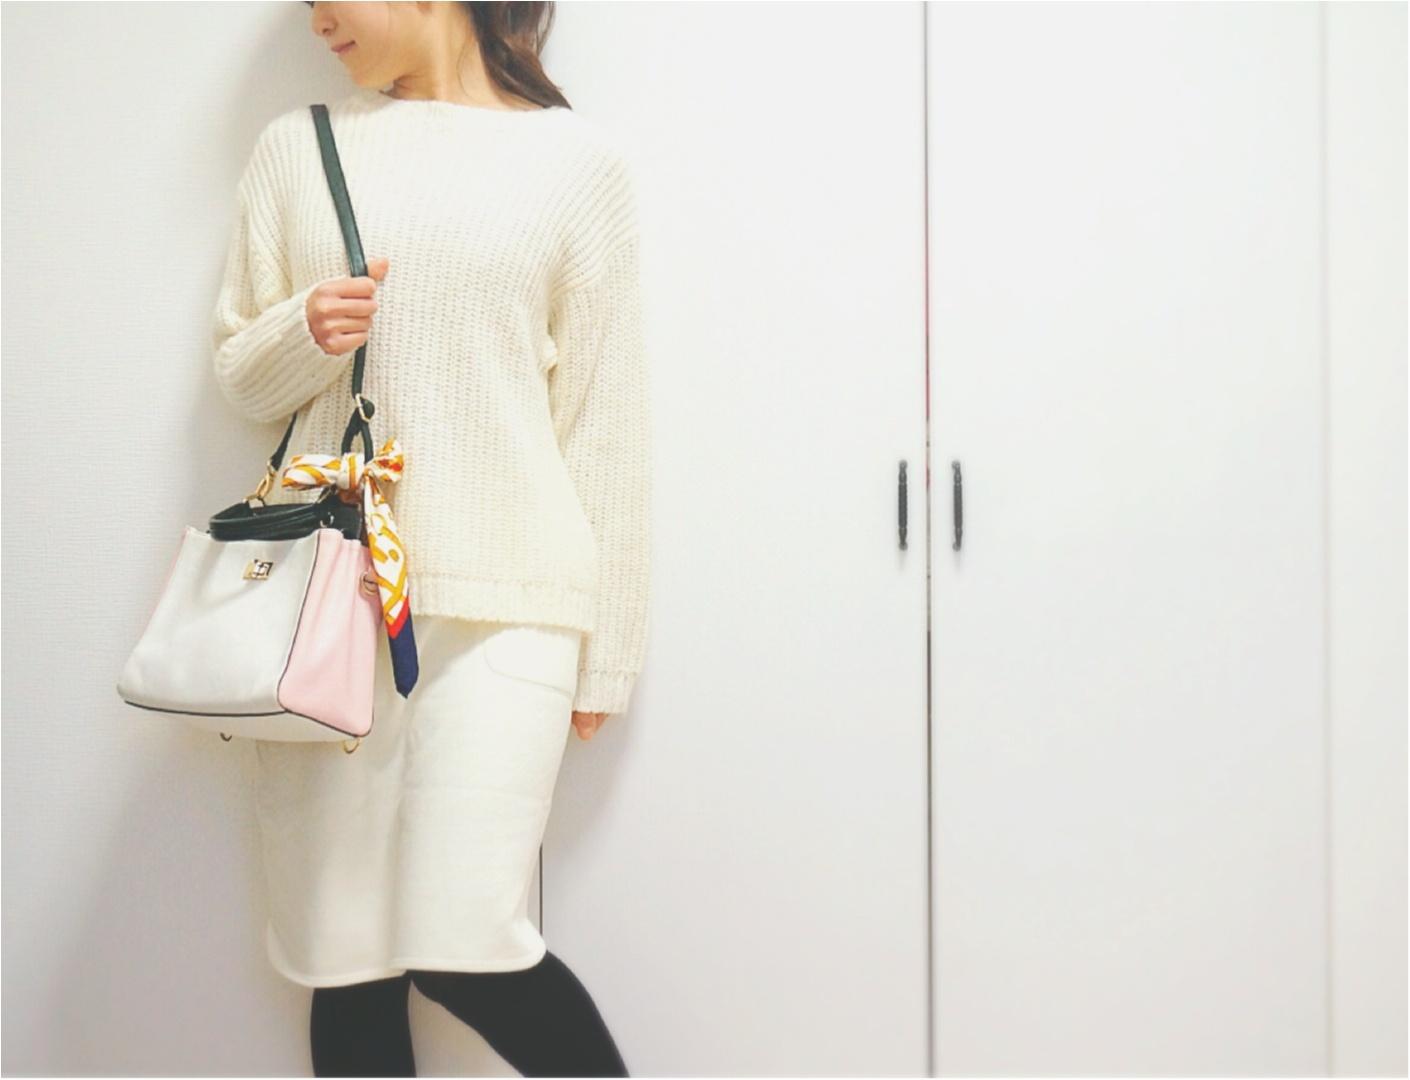 【UNIQLO誕生感謝祭第3弾!】寒い冬もこれで暖か&快適に❤️着回しもしやすい《優秀スカート》を色ち買い!_4